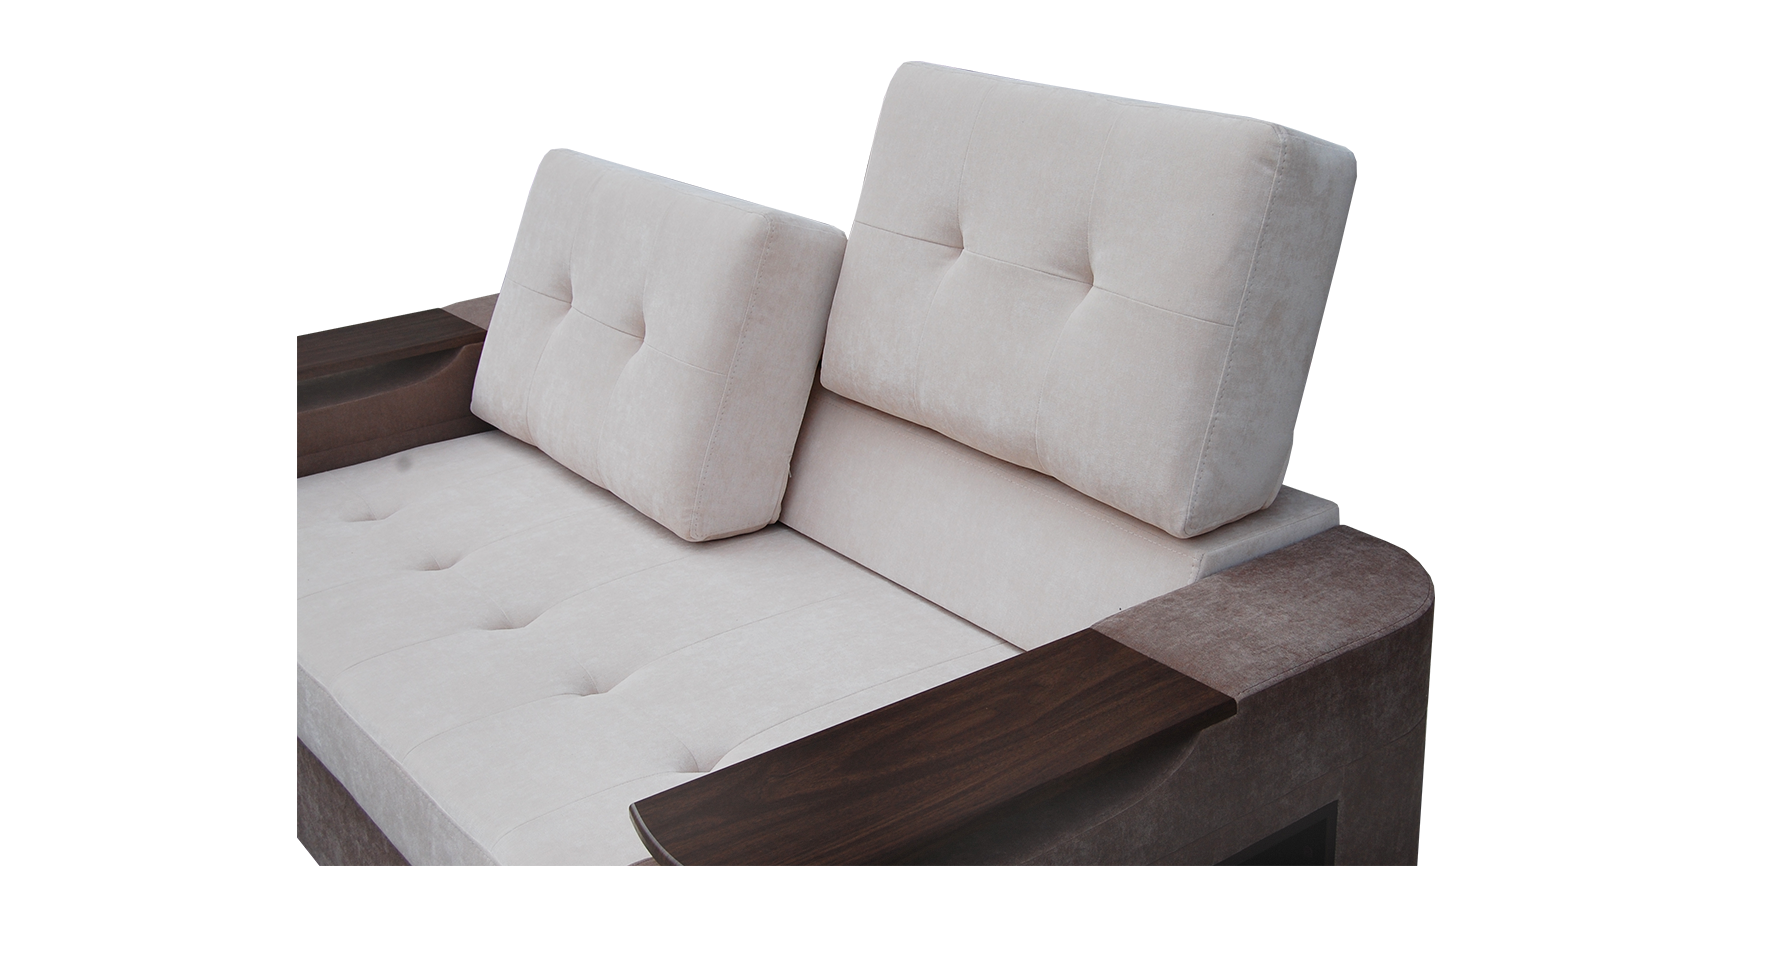 Подъёмные подушки